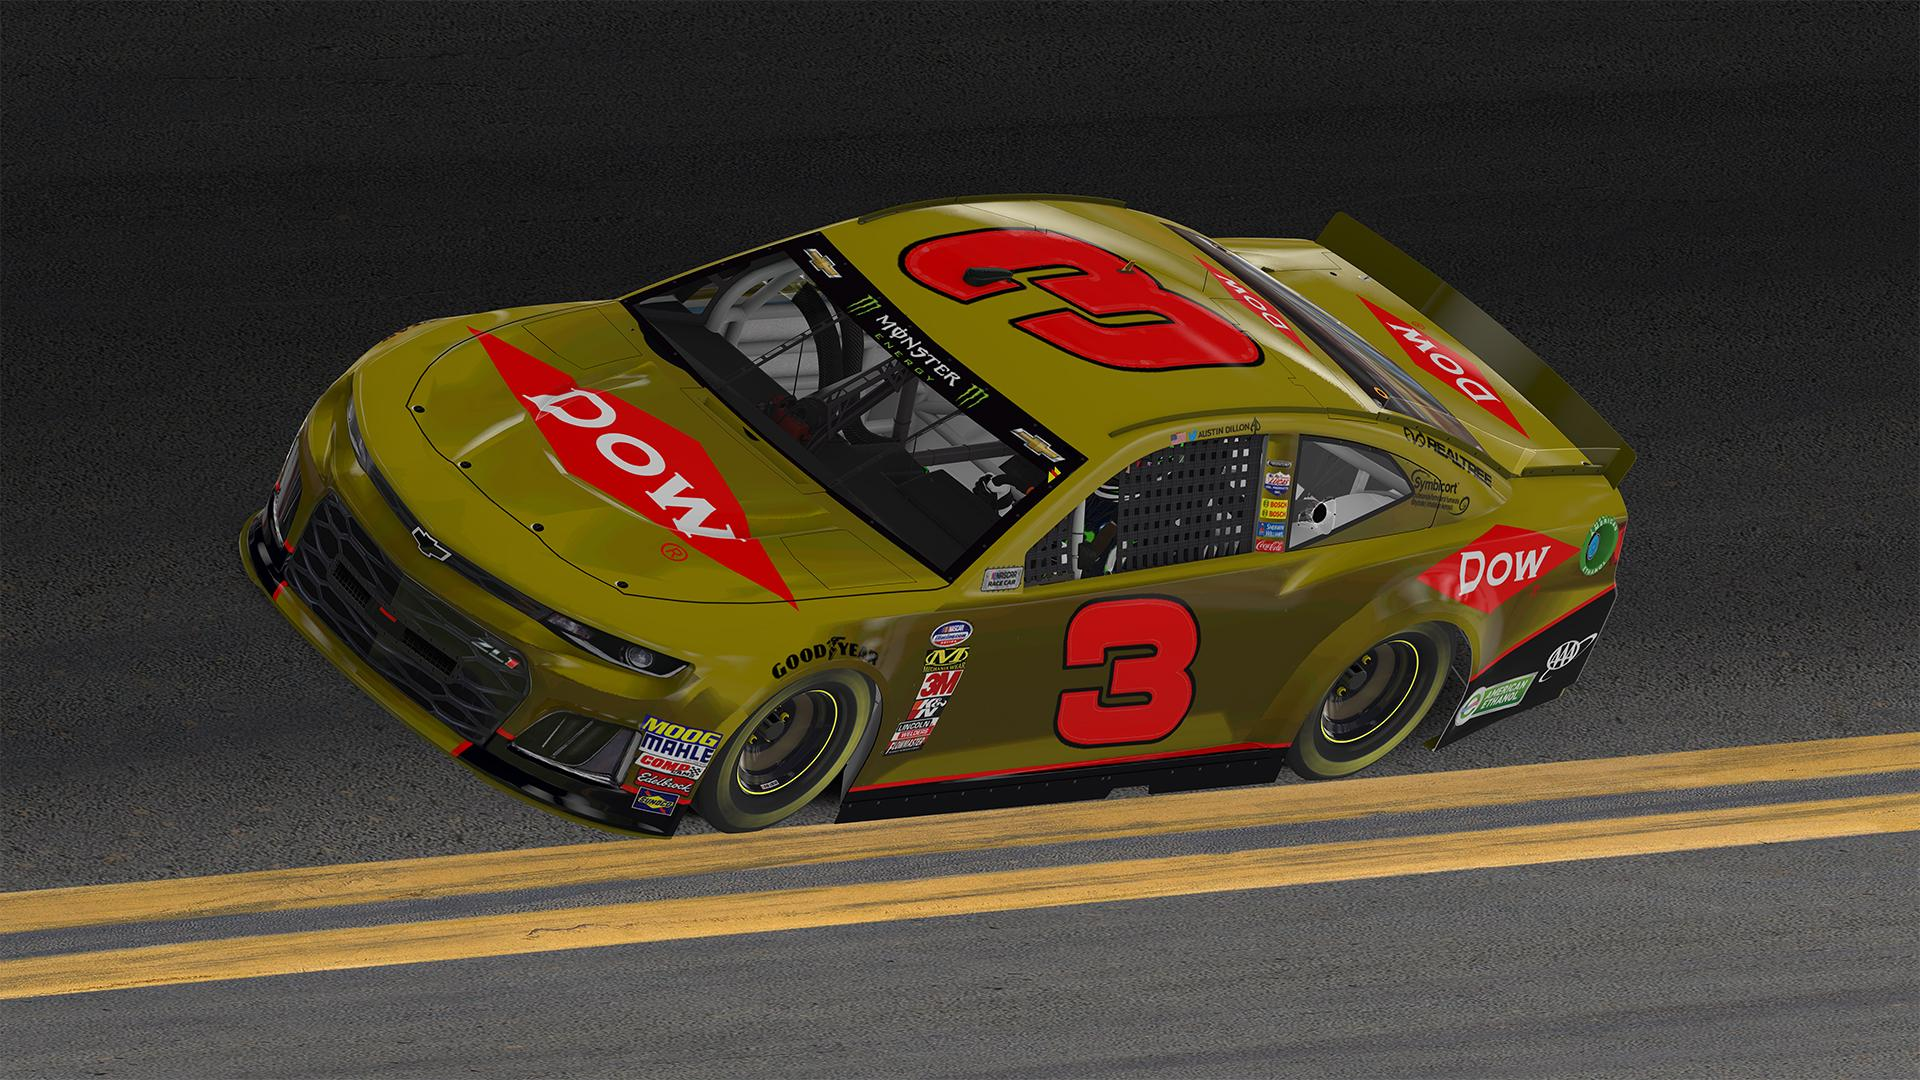 2019 Dow Austin Dillon Daytona 500 Car By Justin Bland